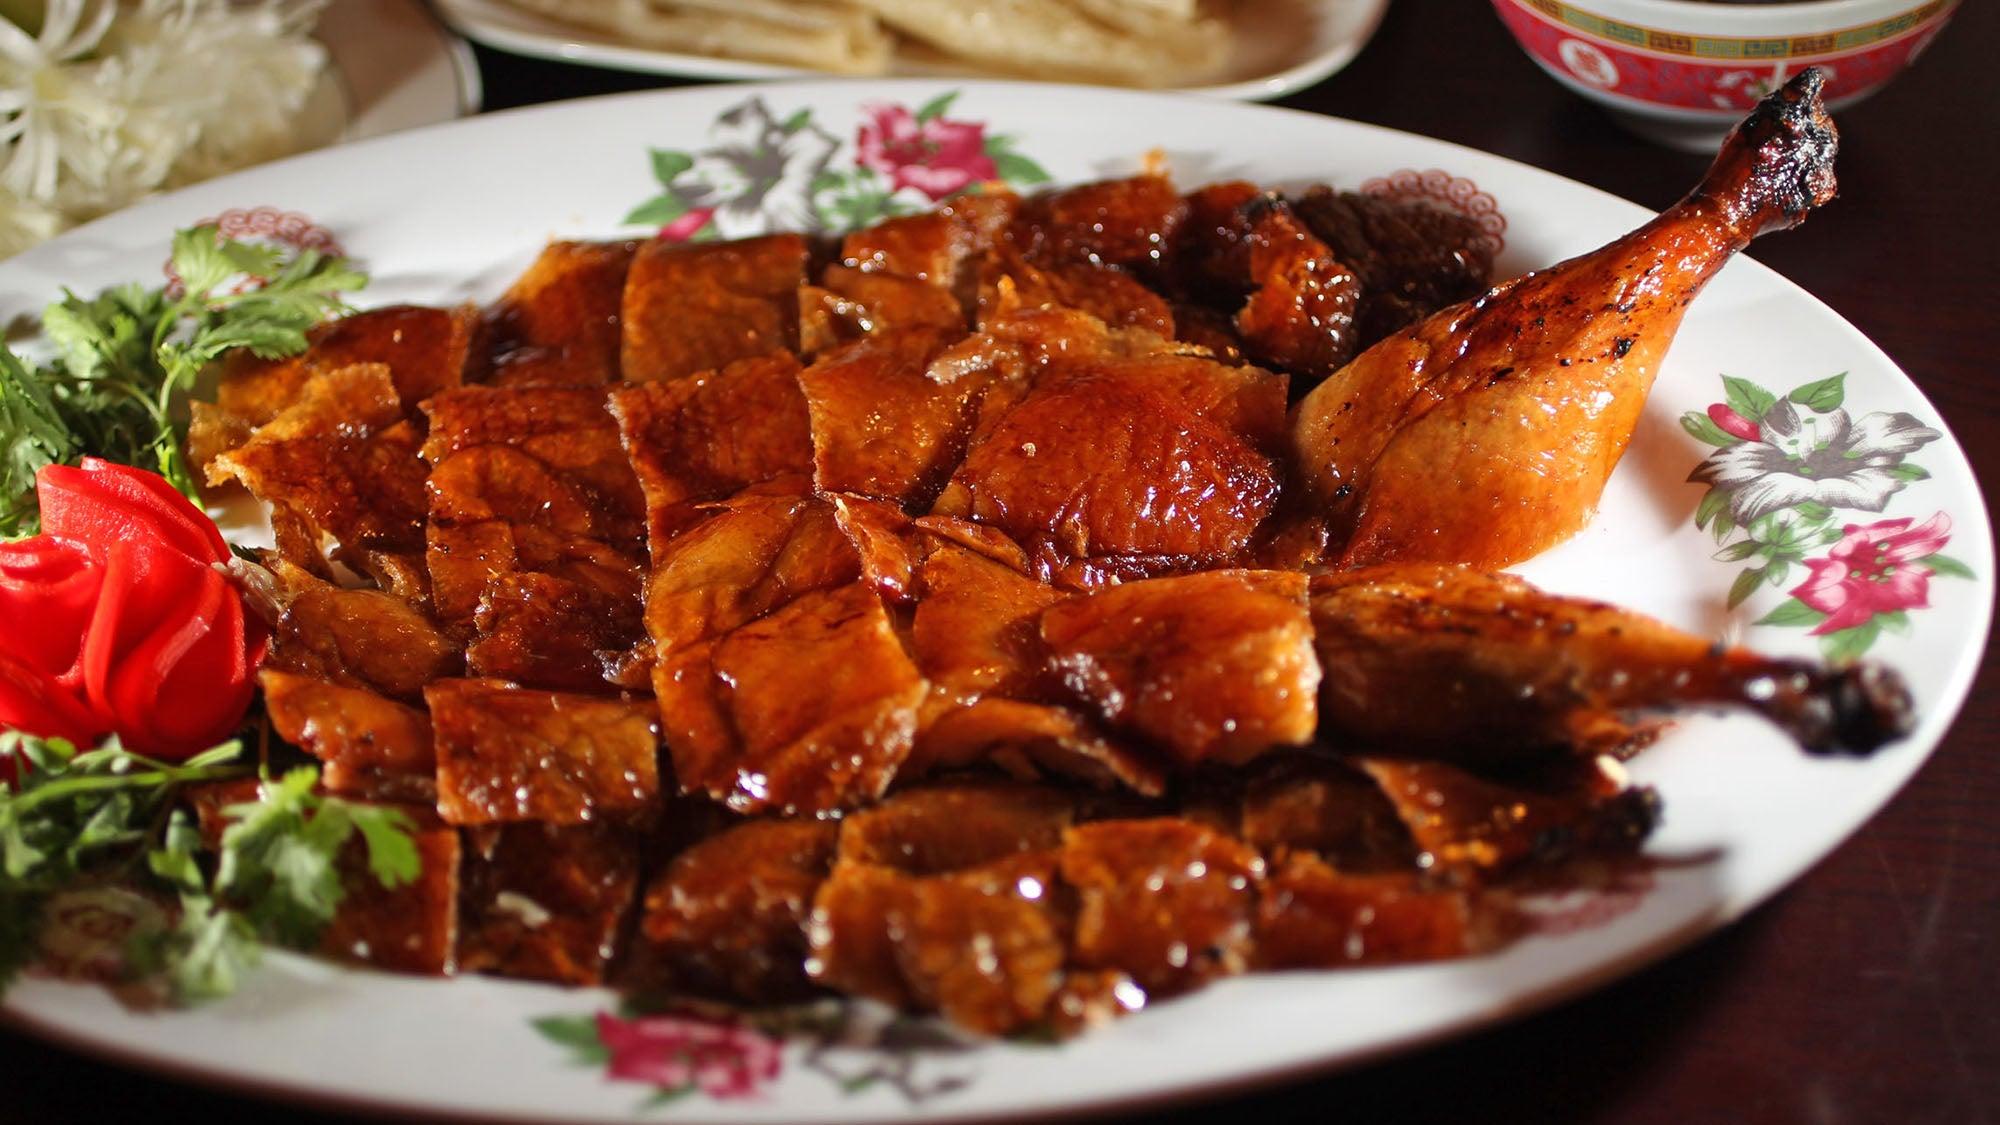 Peking duck at China King